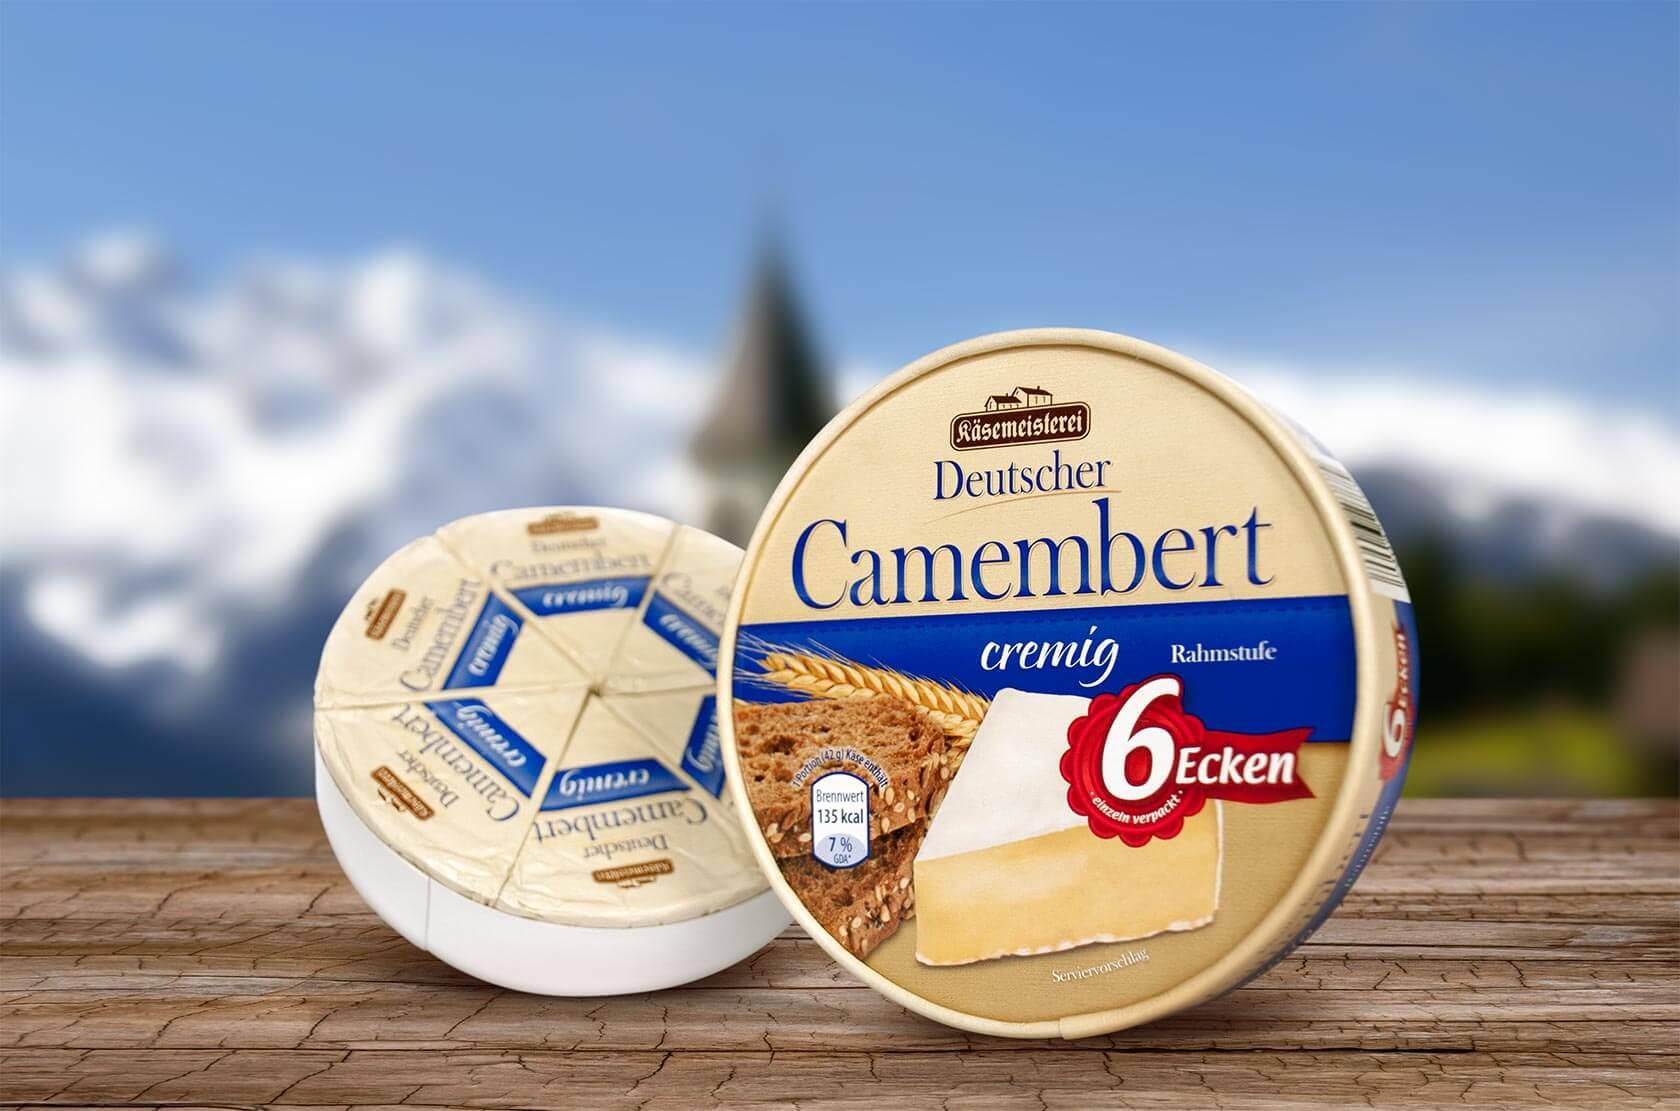 Käserei Champignon – Verpackungsdesign Deutscher Camembert